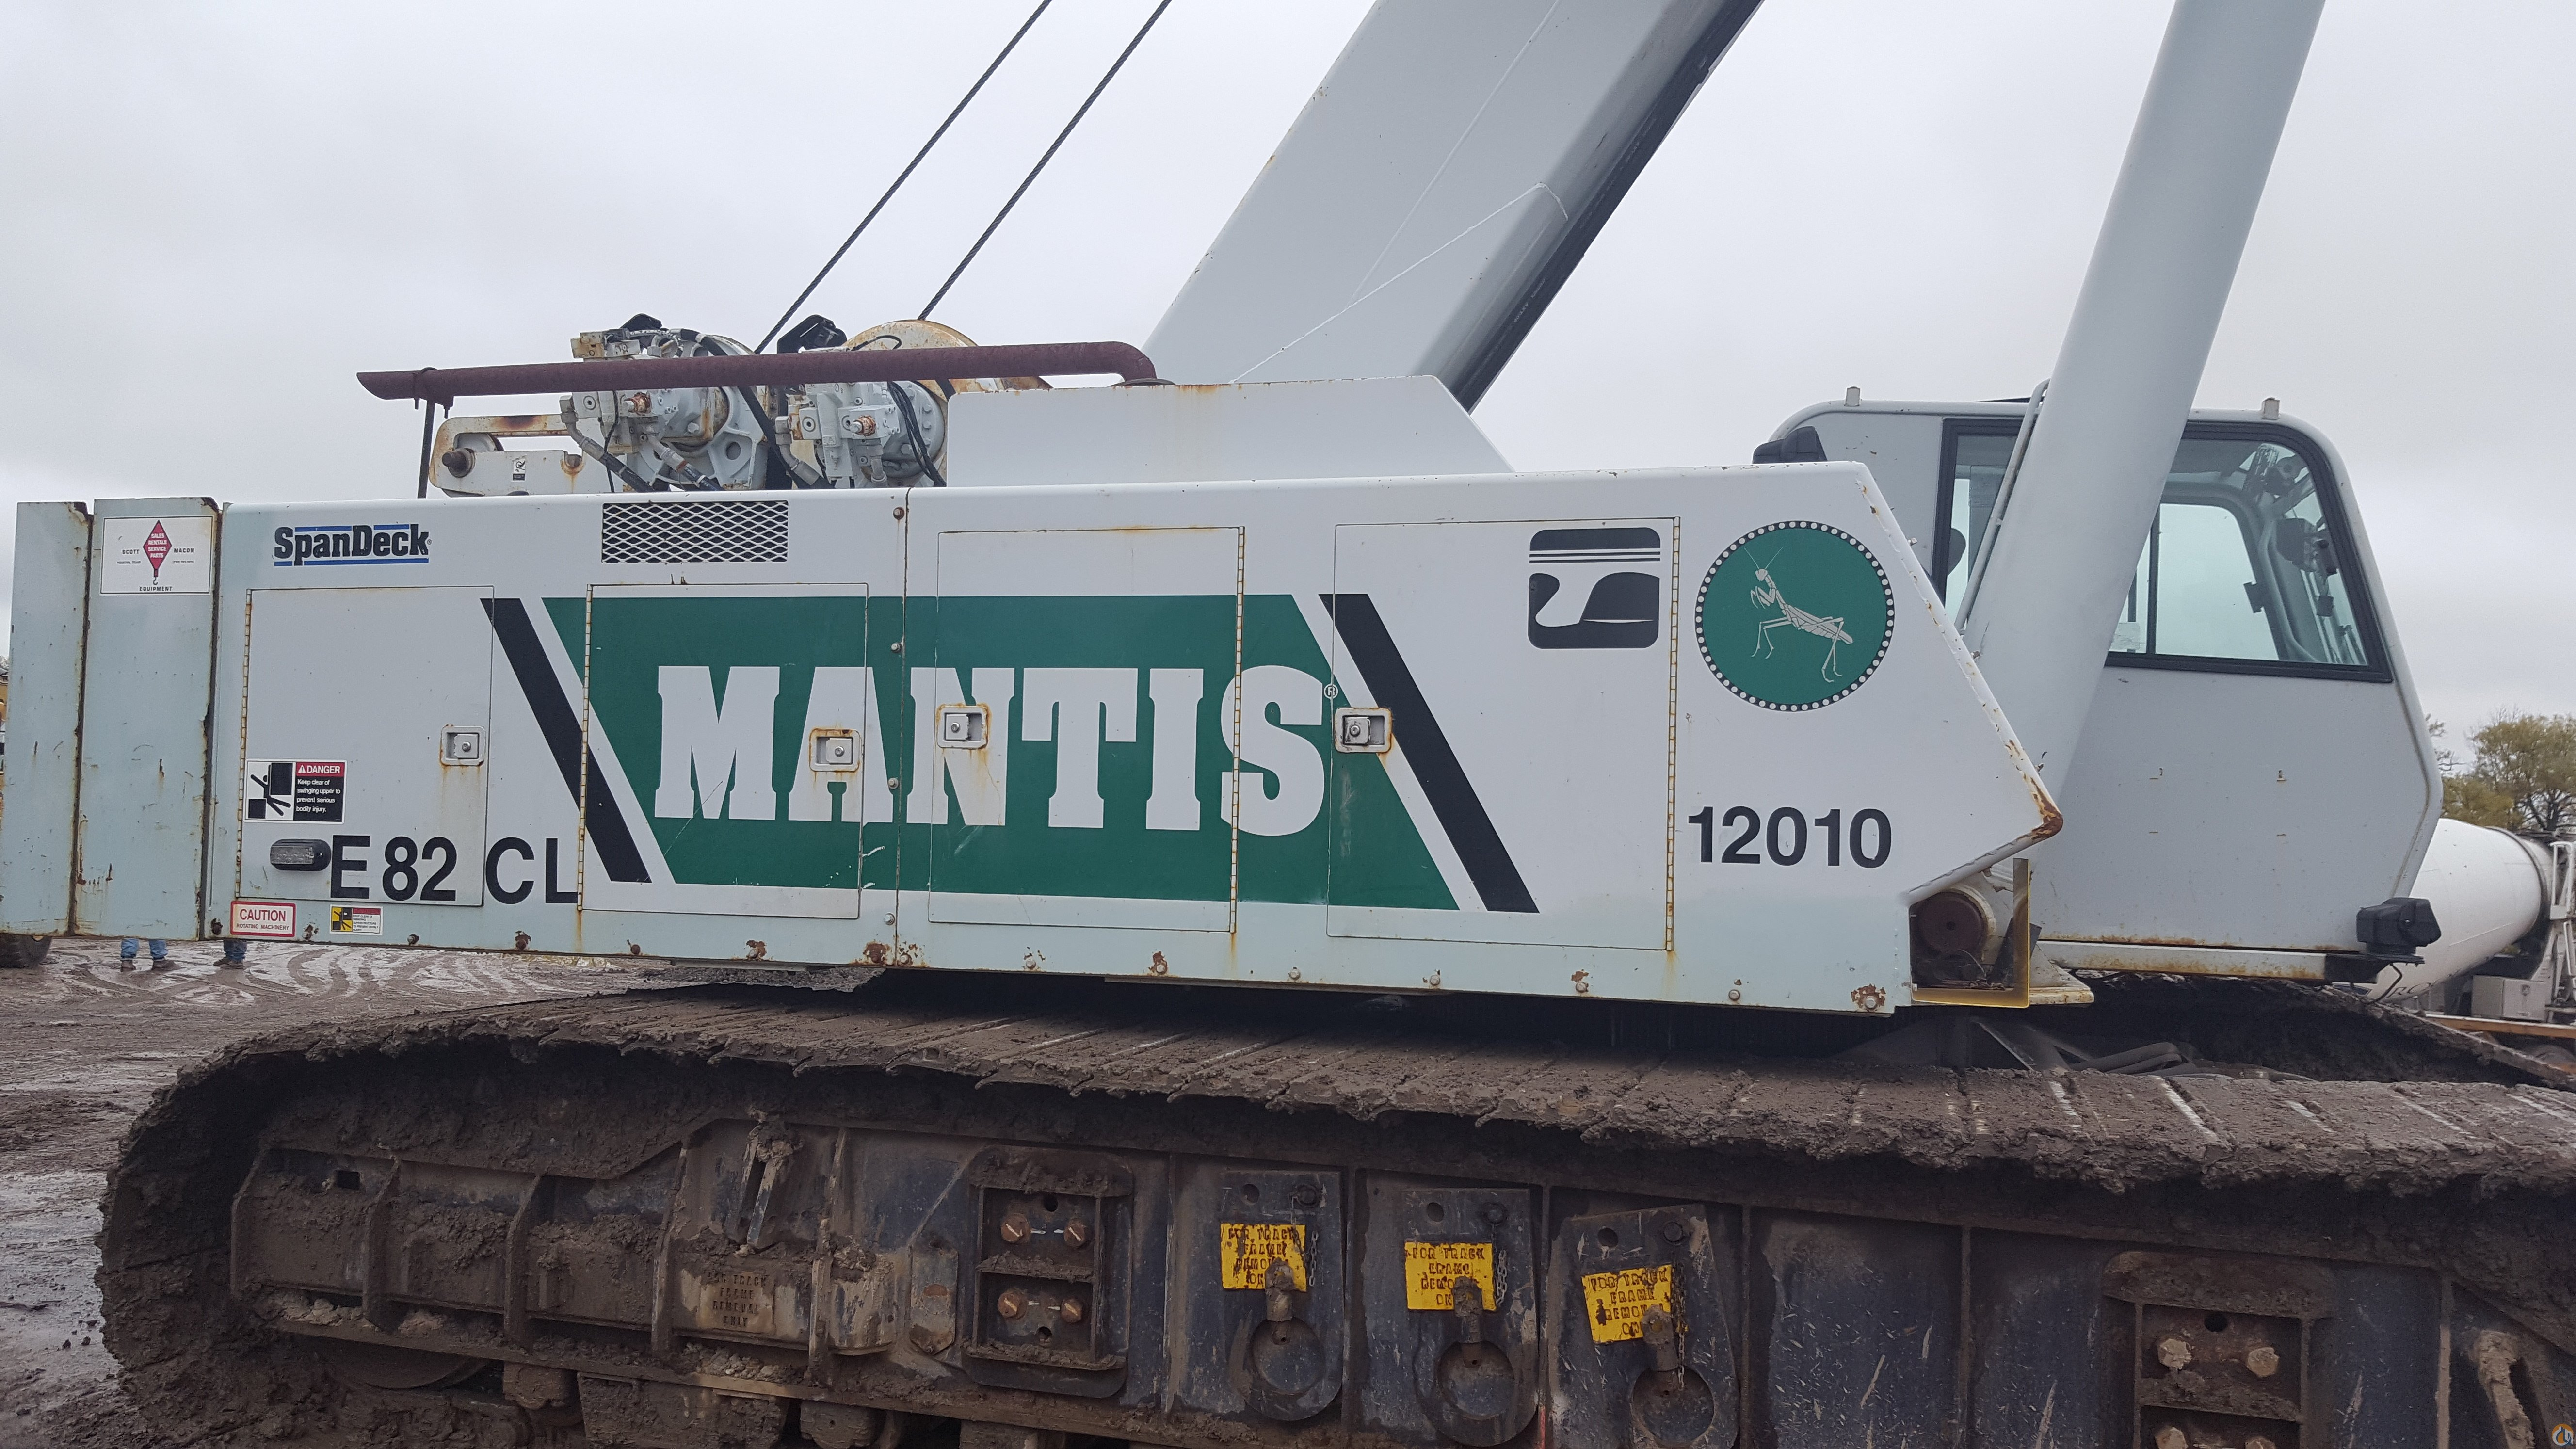 Mantis 3612